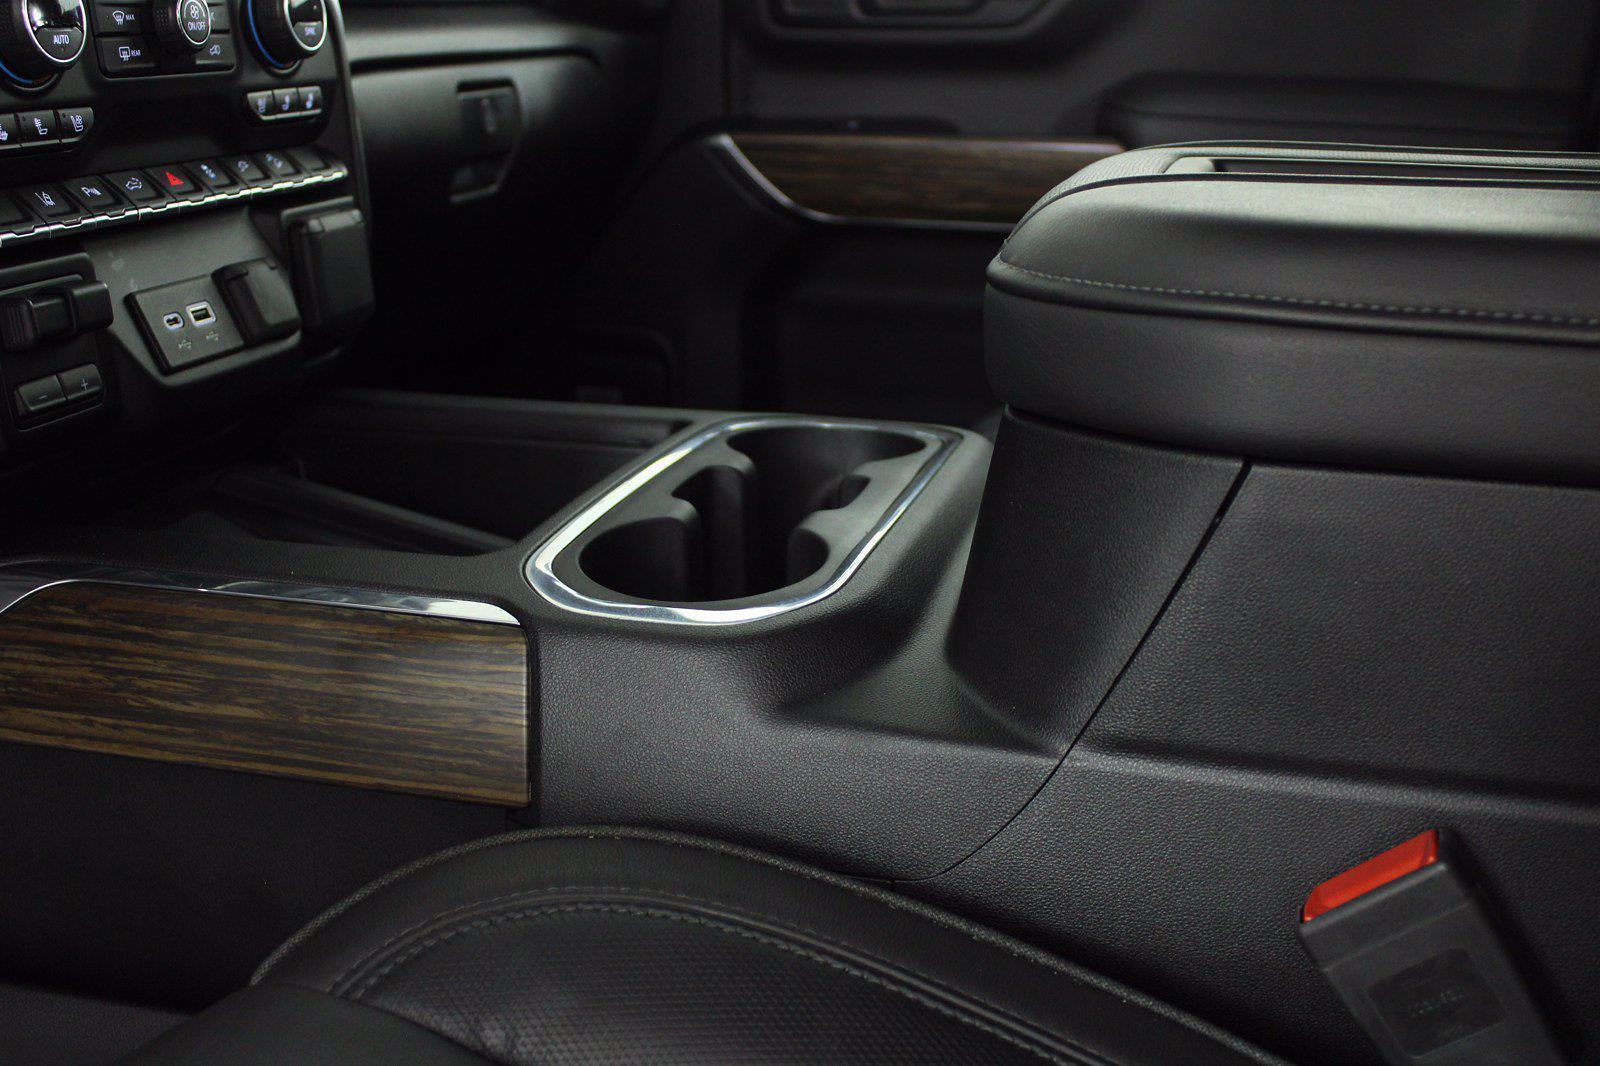 2020 Chevrolet Silverado 3500 Crew Cab 4x4, Pickup #DAZ0607 - photo 6